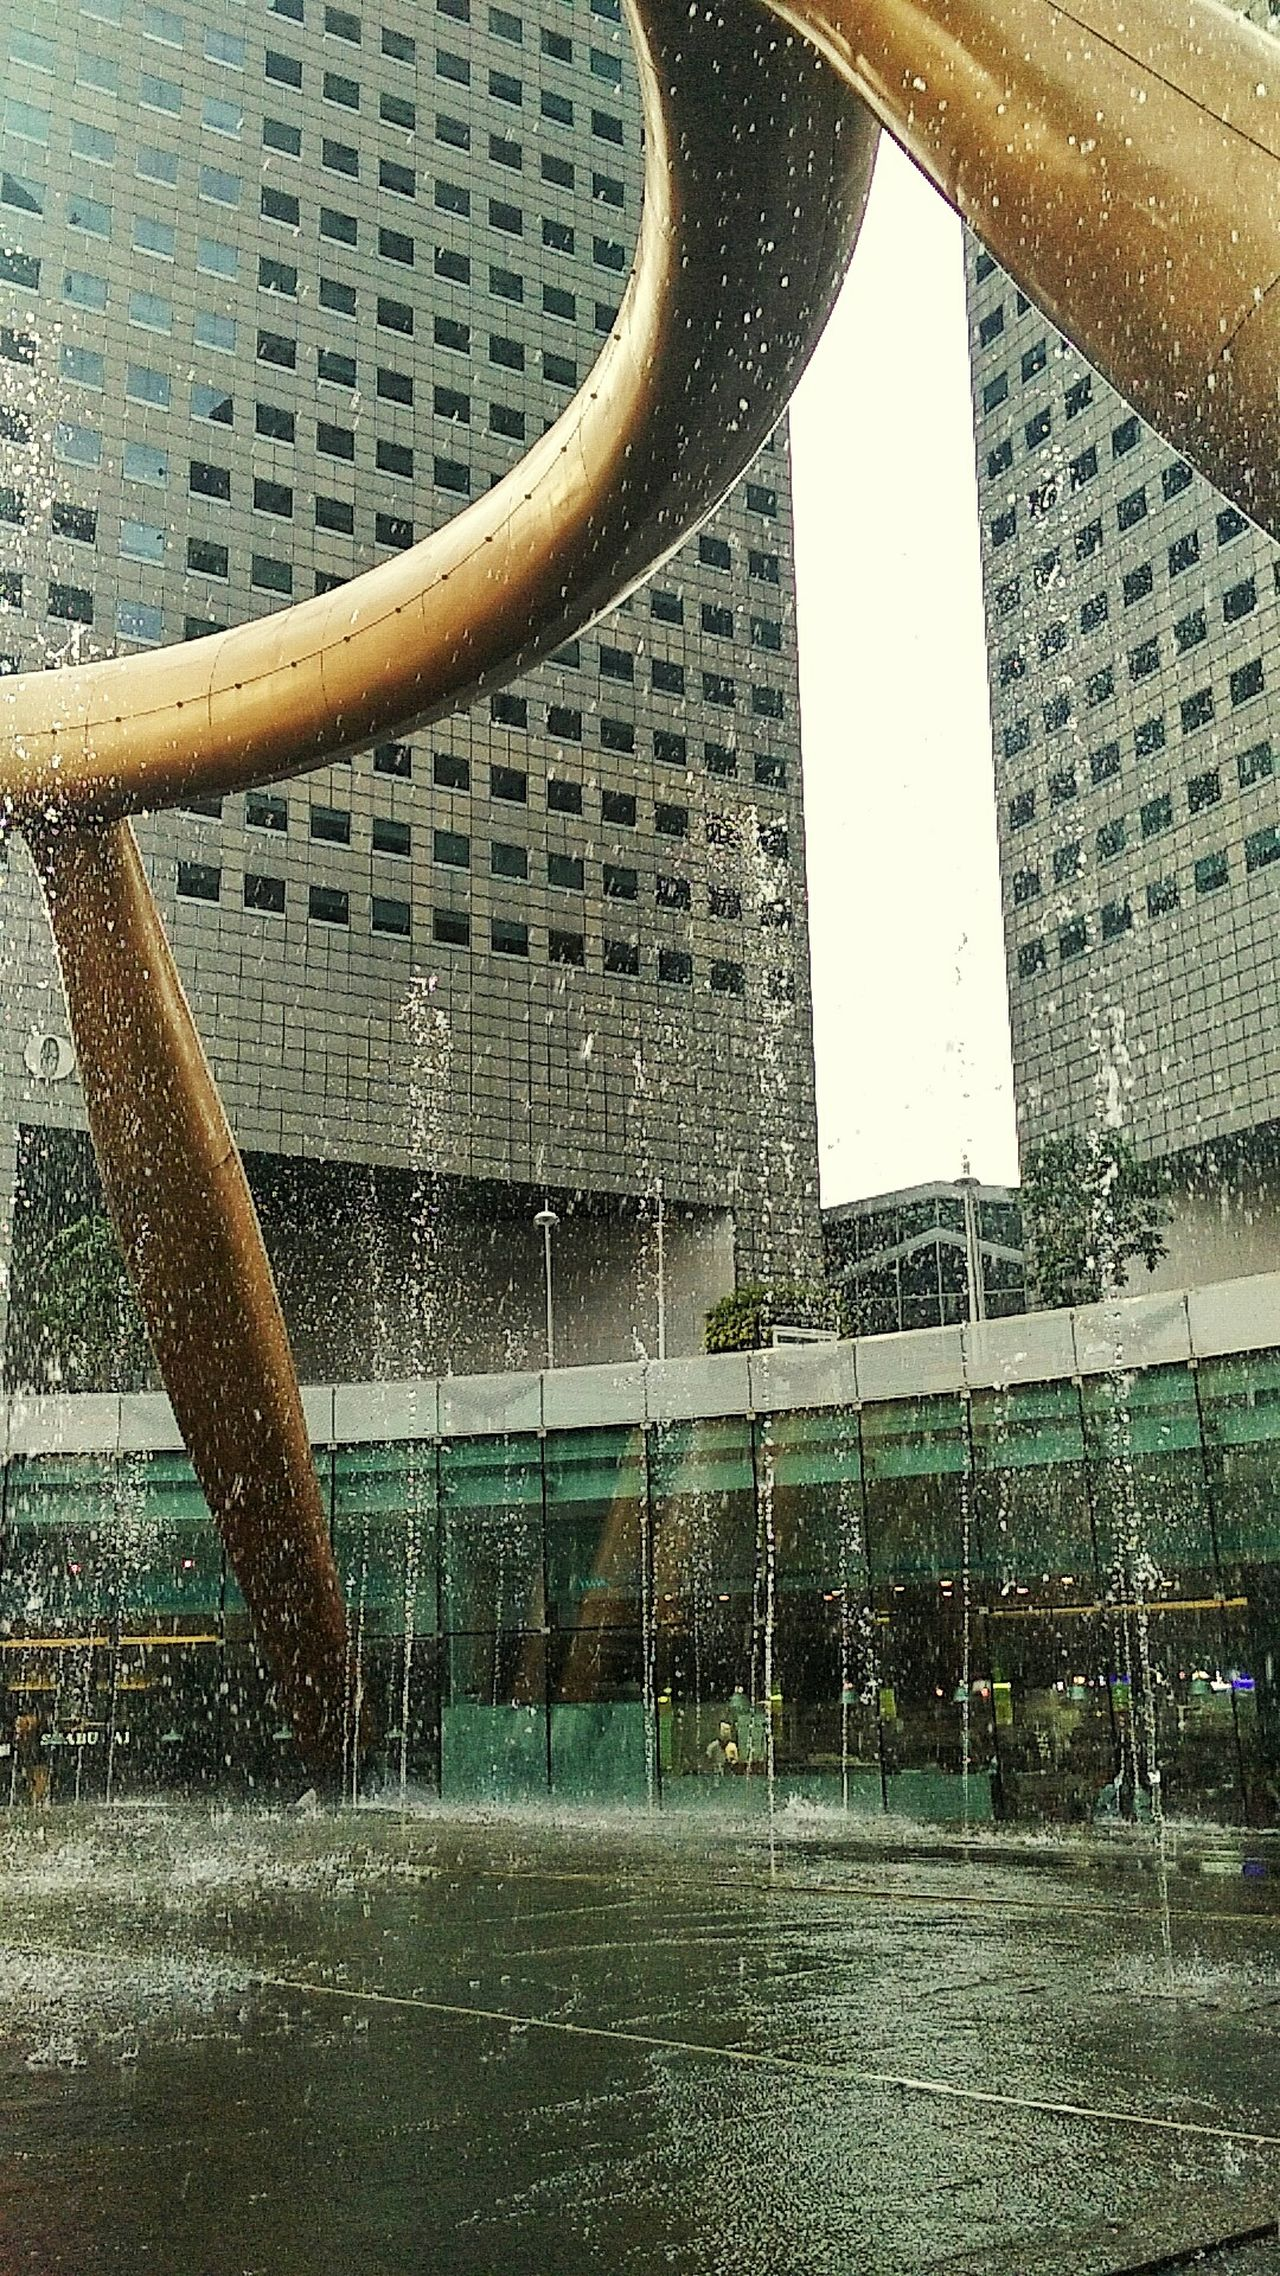 Fountainofwealth Fountain Water Design Architecture Structure Exterior Lowangleview Lowangle Lowangleshot Urban Travel Wander Goodlife Outdoors Stroll Explore Learn WanderingInSolitude Stationary Motion Goingsolo XishiWanders Singapore